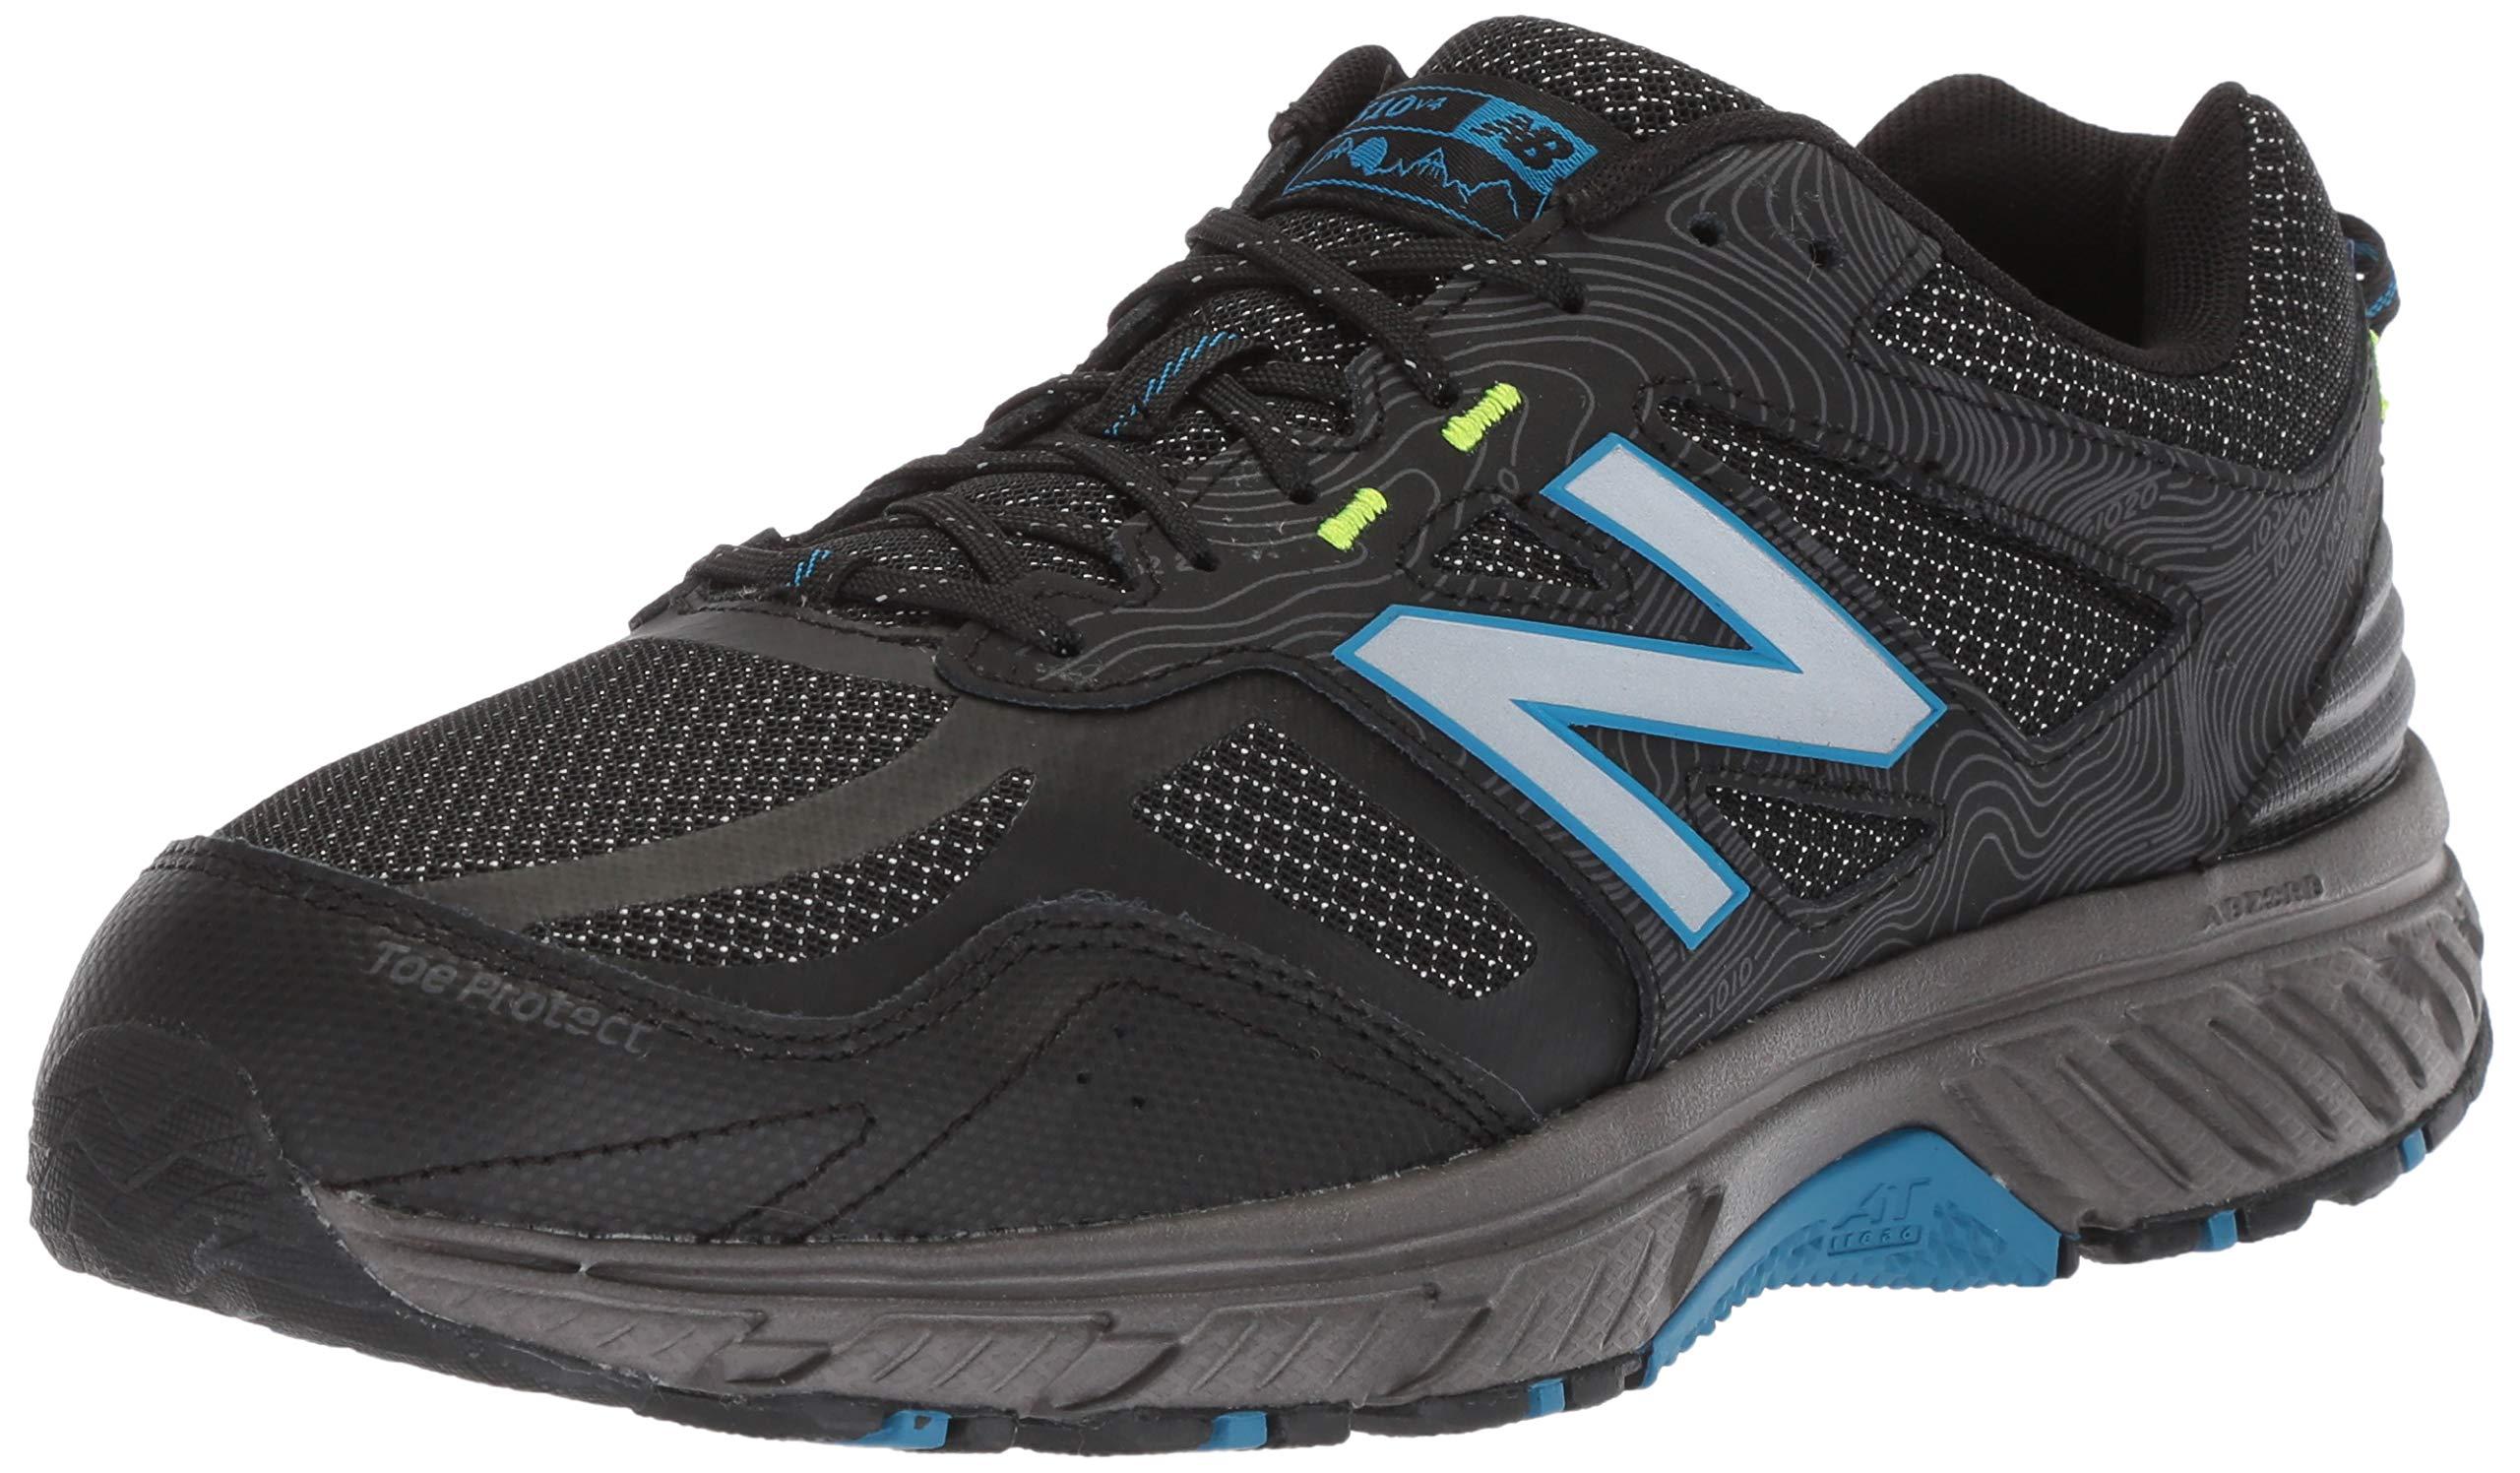 New Balance Men's 510v4 Cushioning Trail Running Shoe, Magnet/Black/Reflective, 7 D US